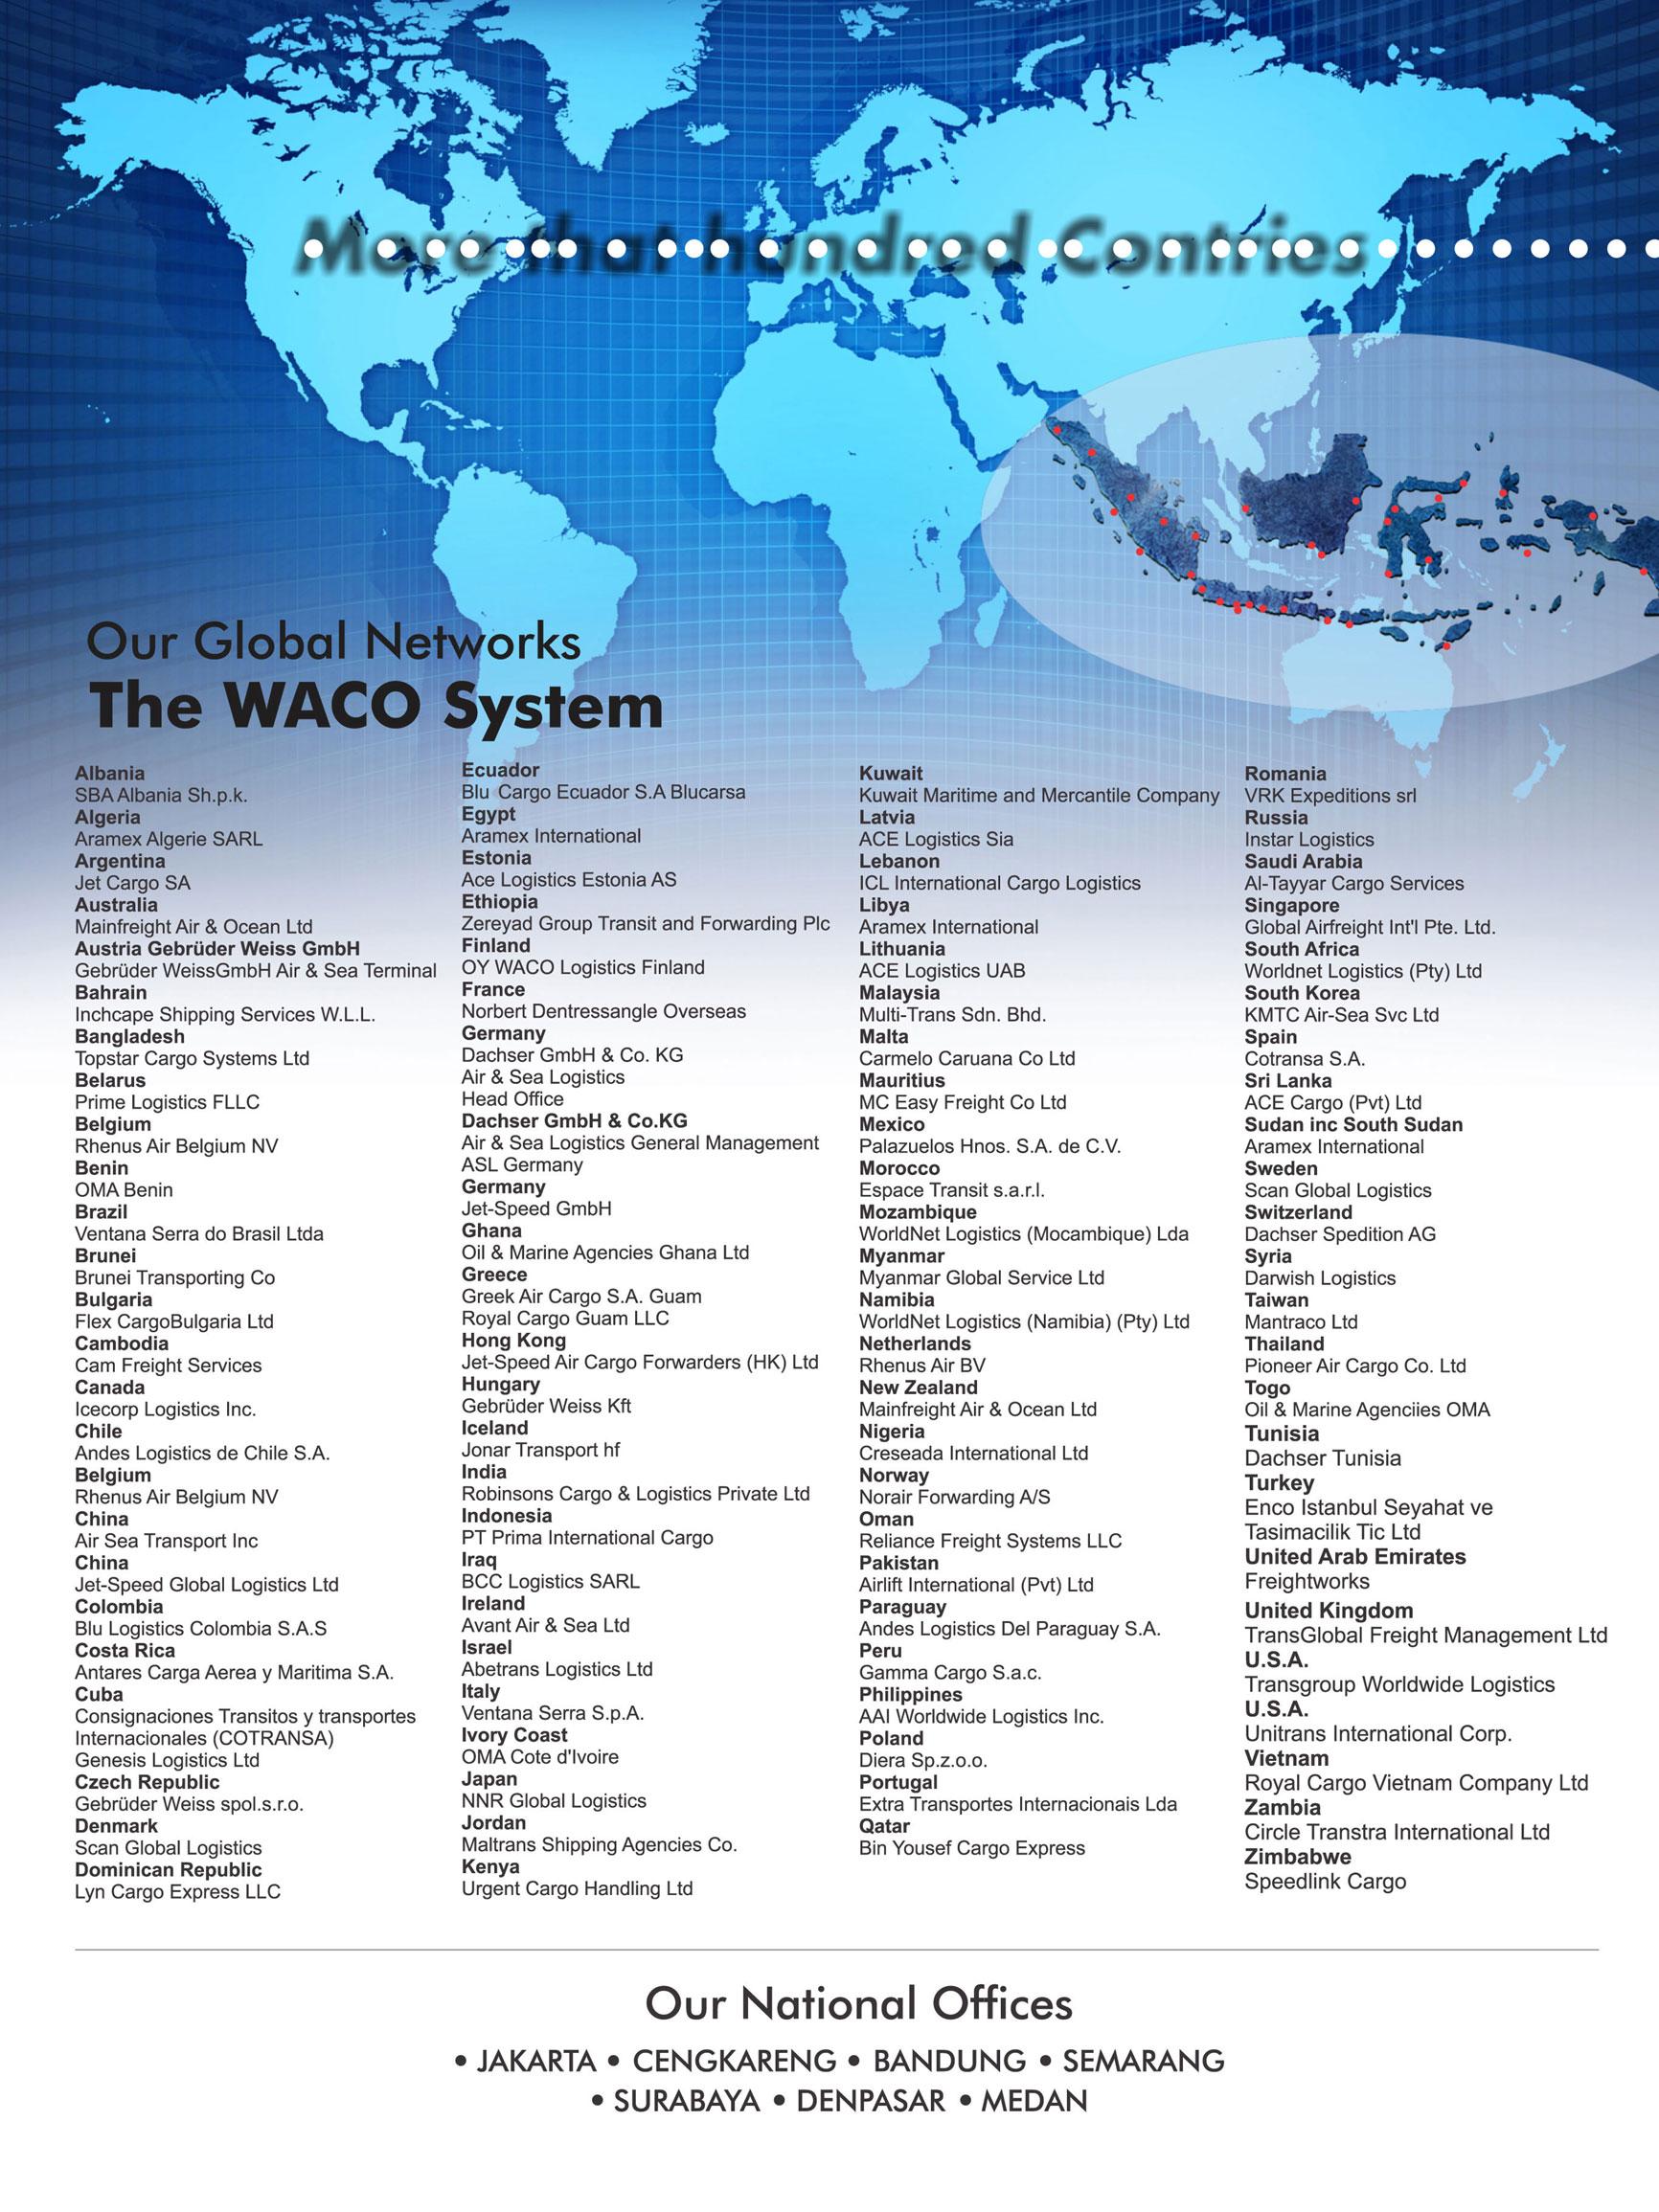 The WACO System